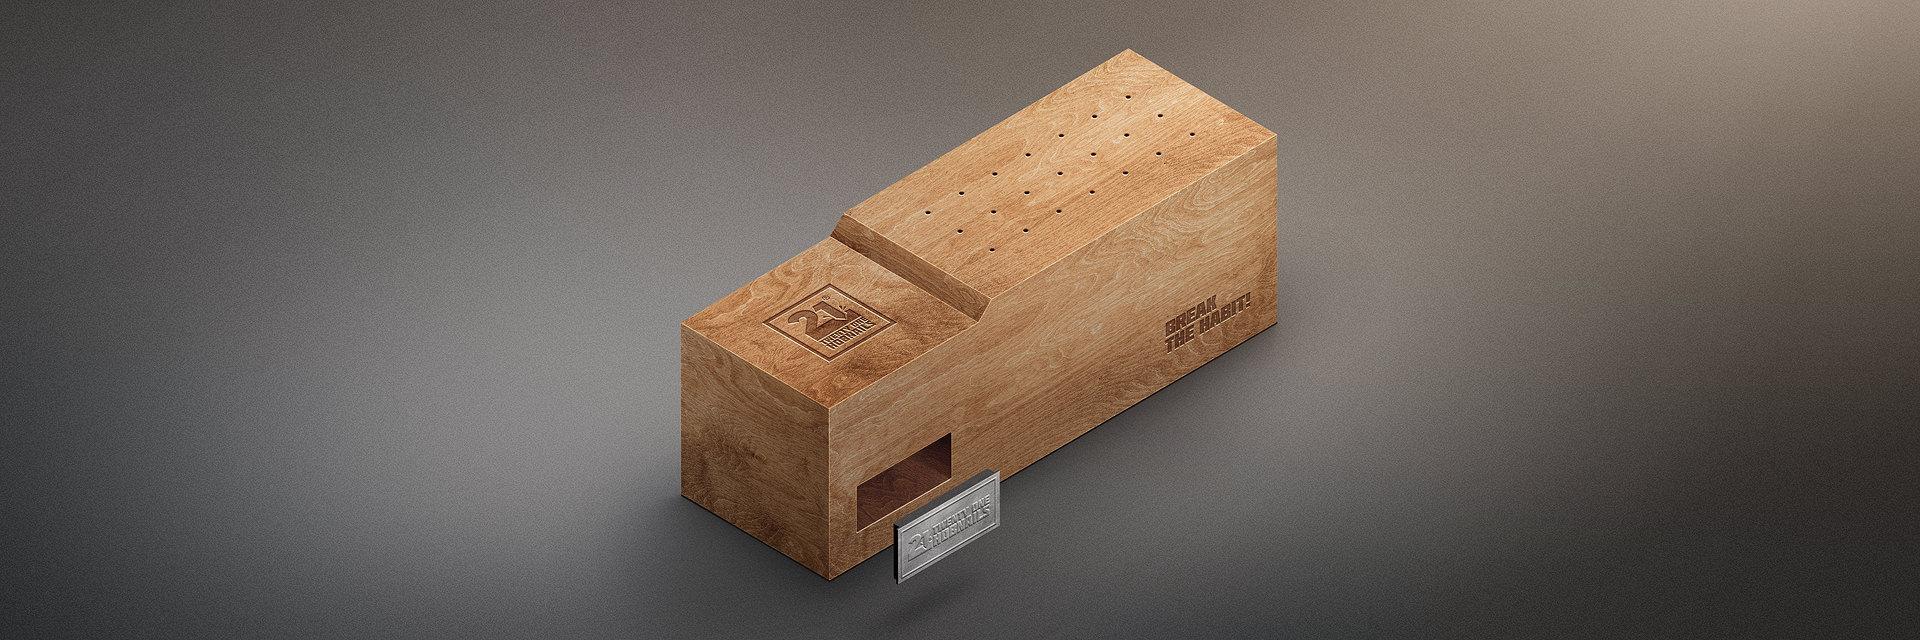 Twenty One Hobnails Wood Block Project